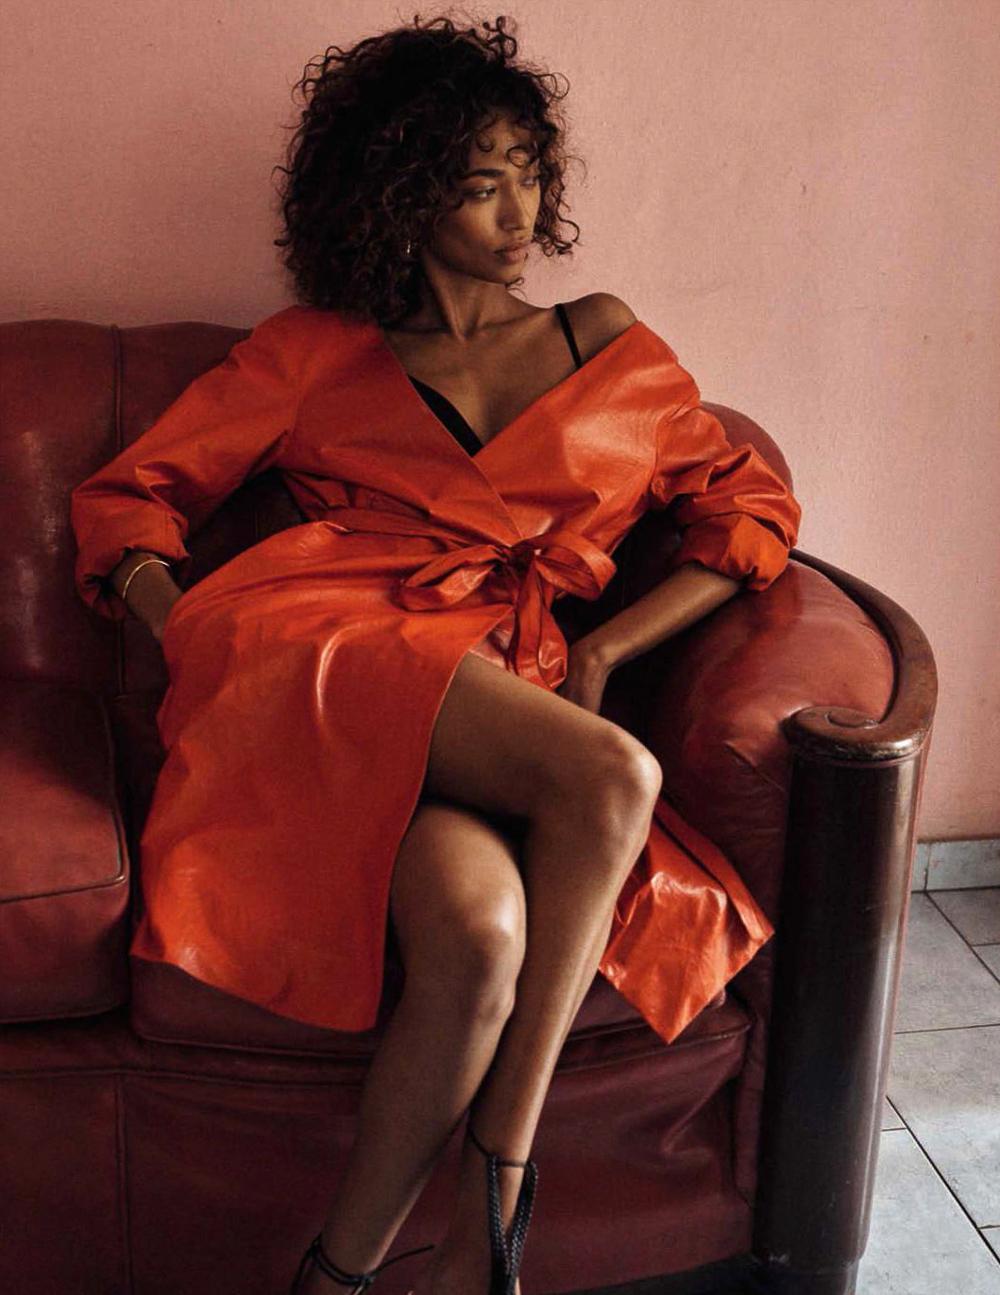 Bienvenido Cuba - Anais Mali by Benny Horne in Vogue Spain March 2016